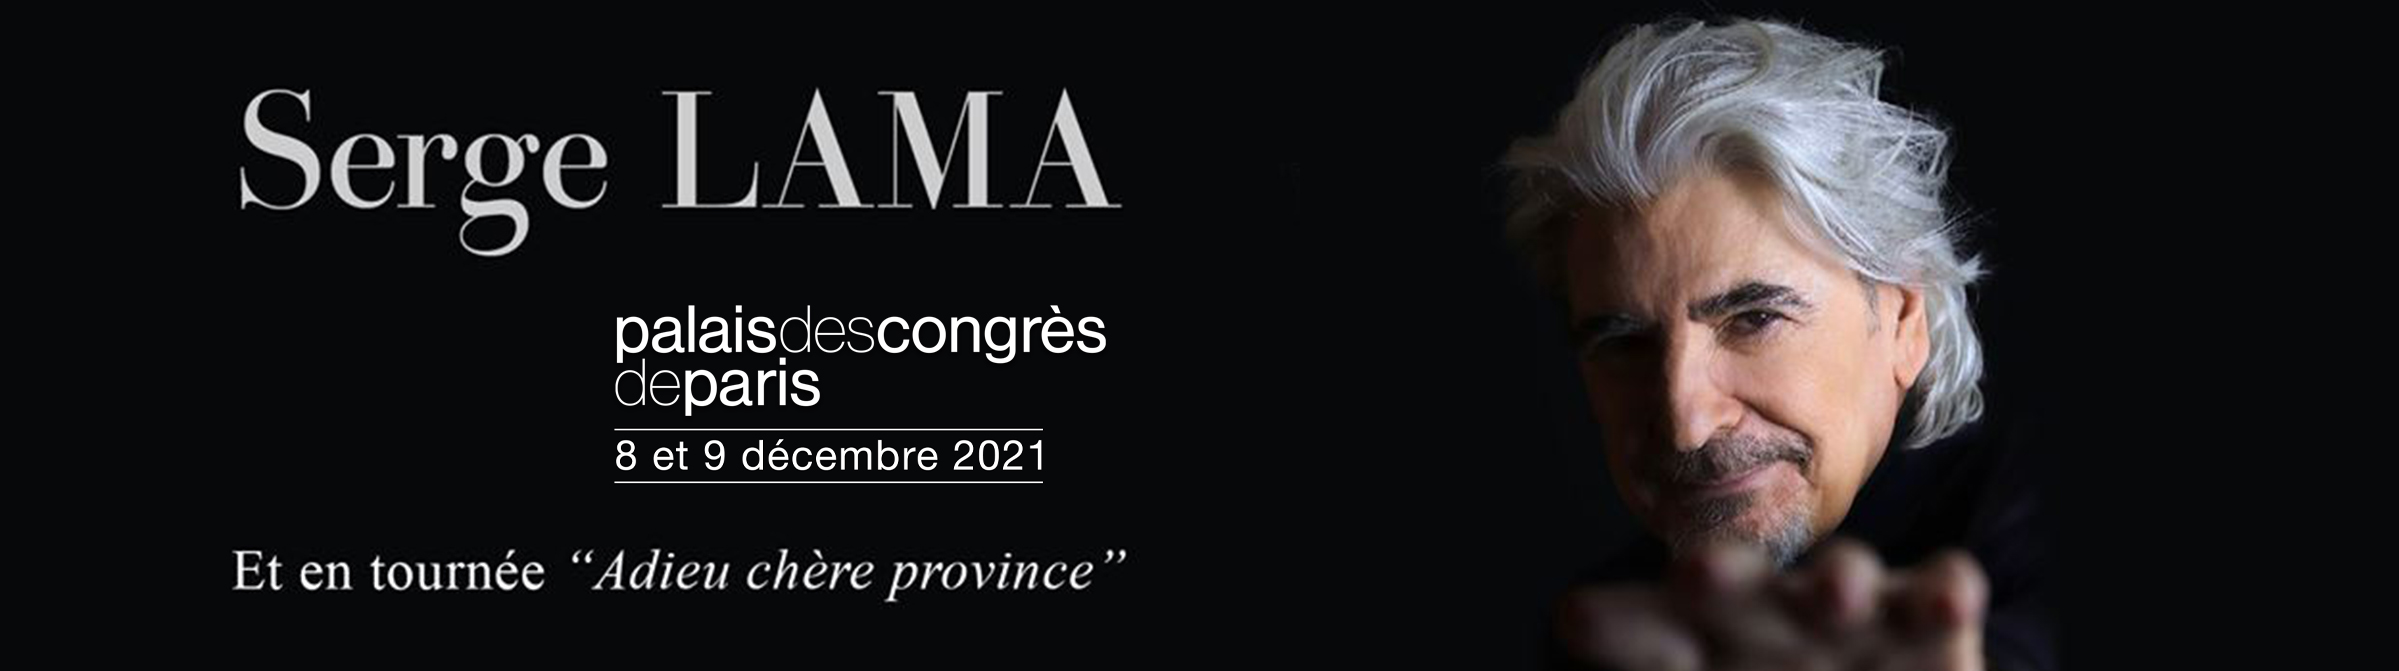 Serge Lama Concert